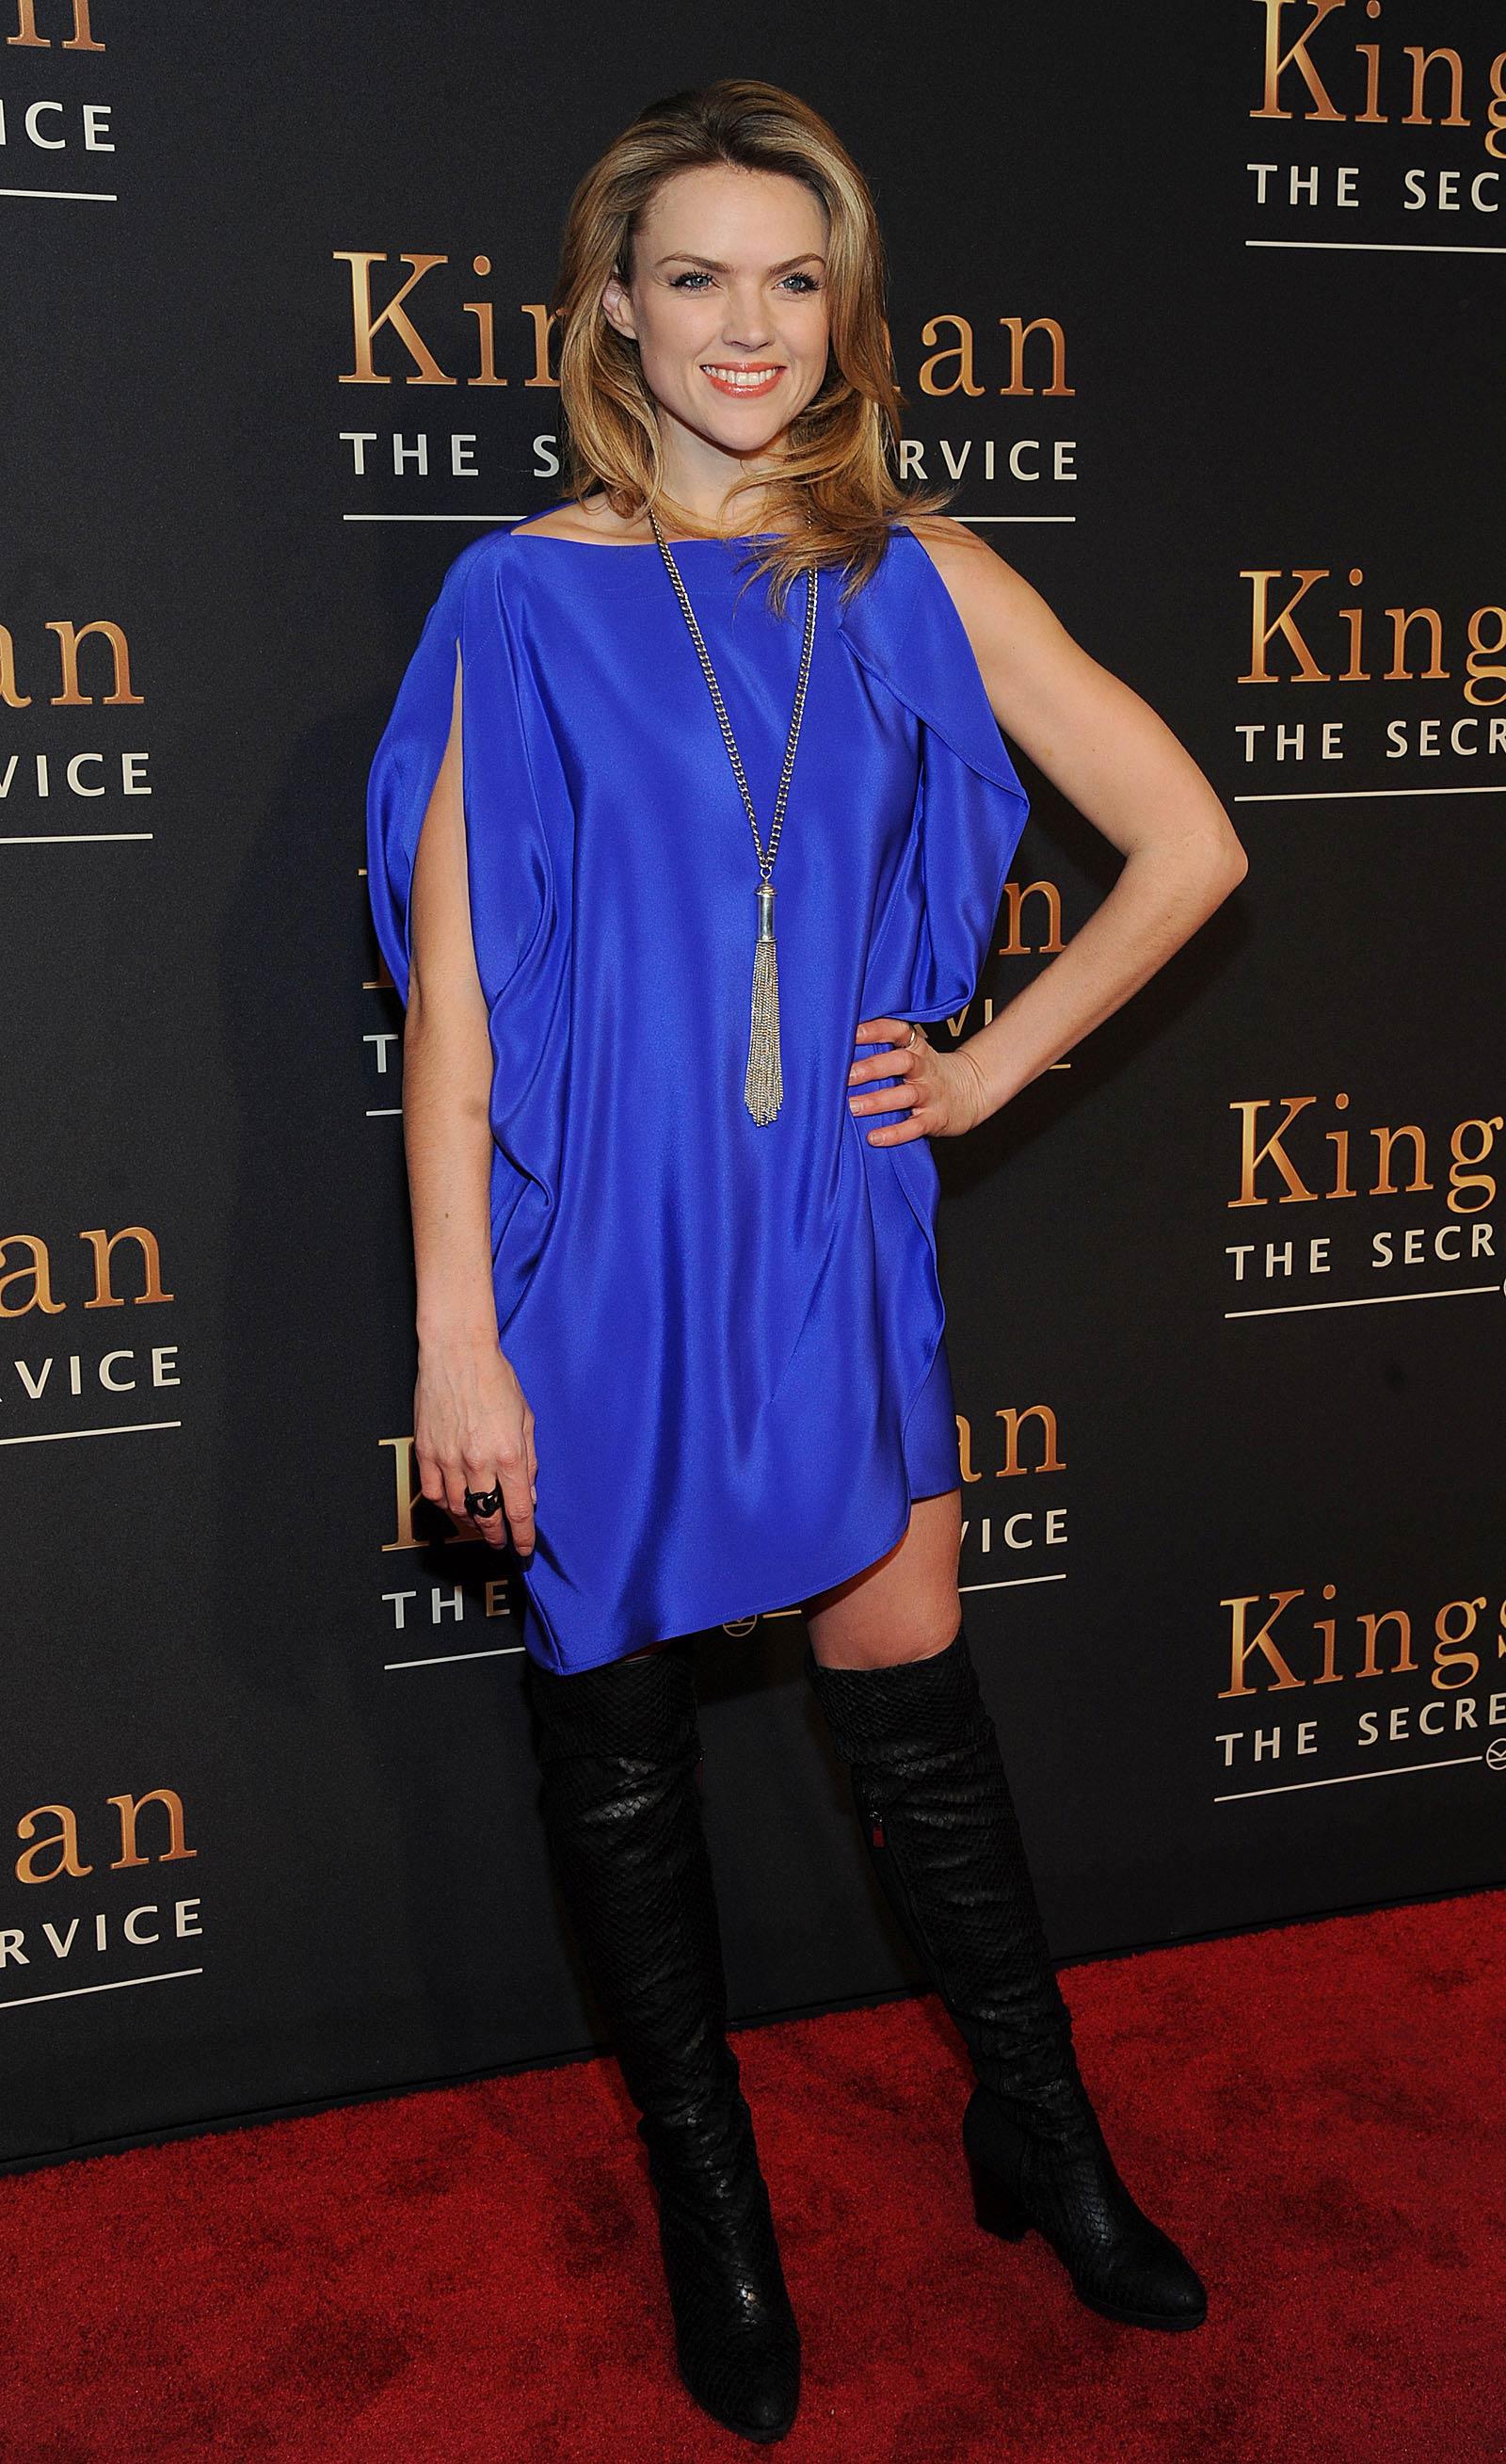 Erin Richards attends Kingsman The Secret Service premiere